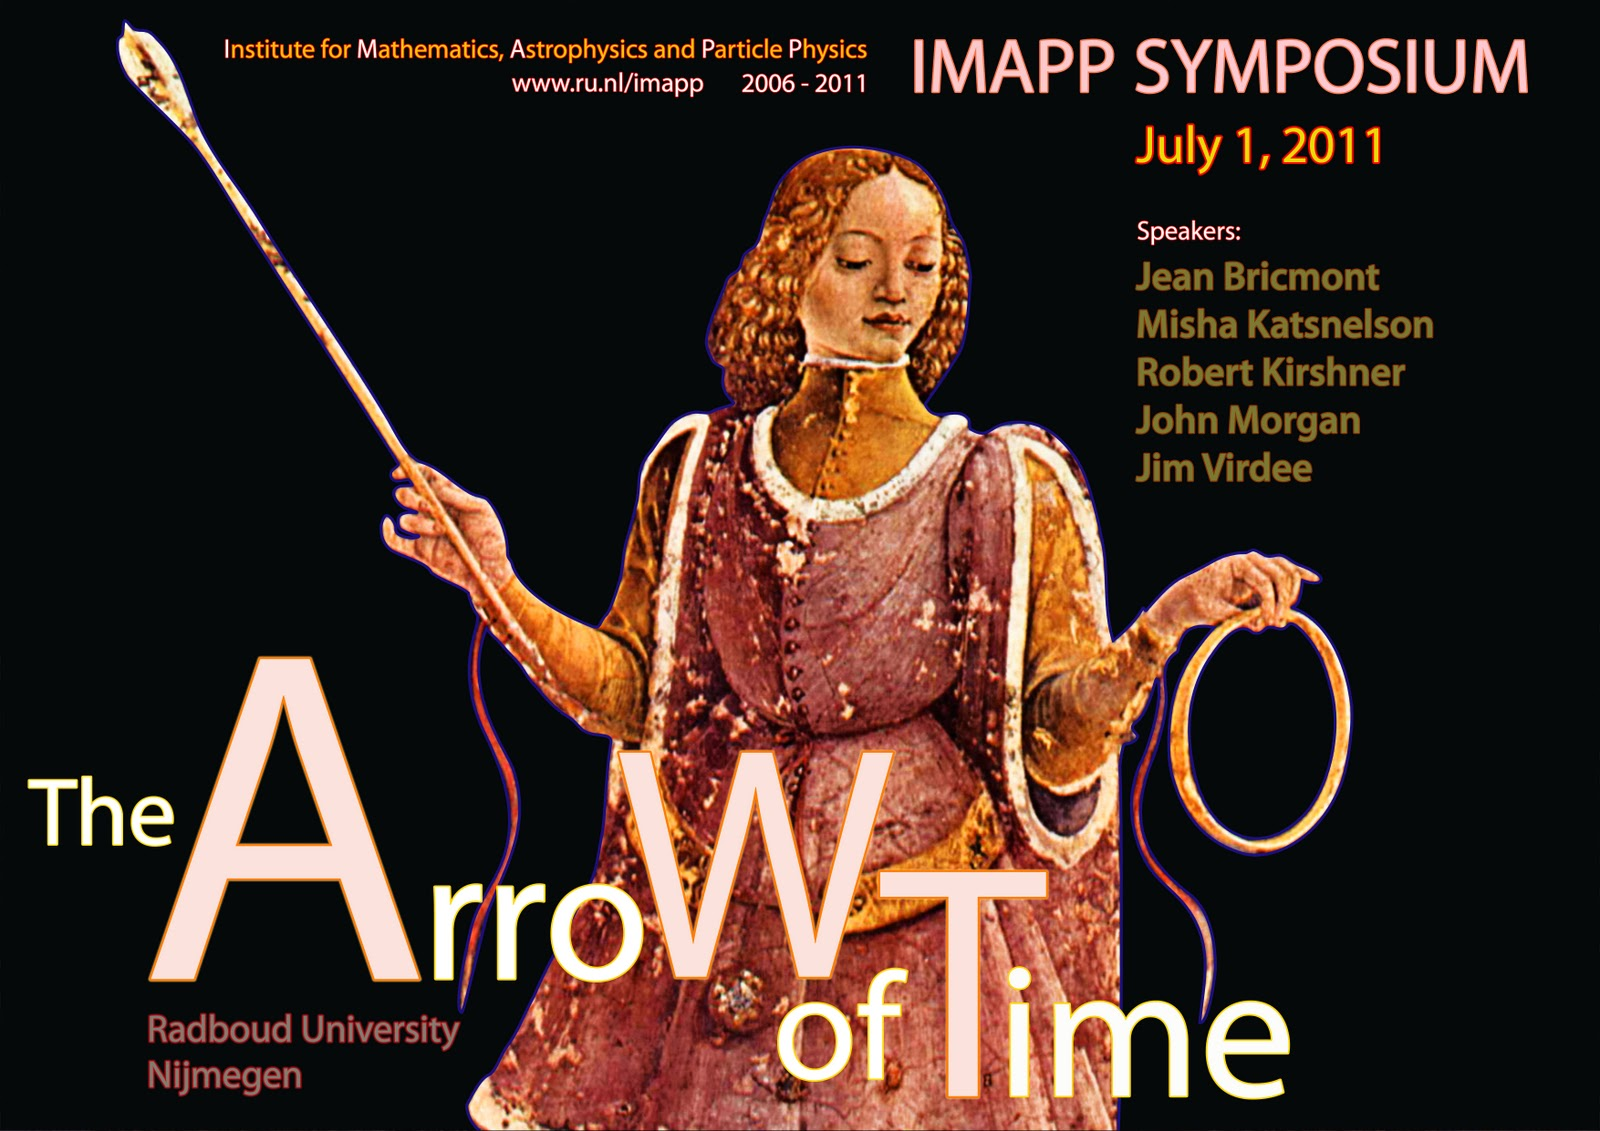 arrow of time, frank waaldijk